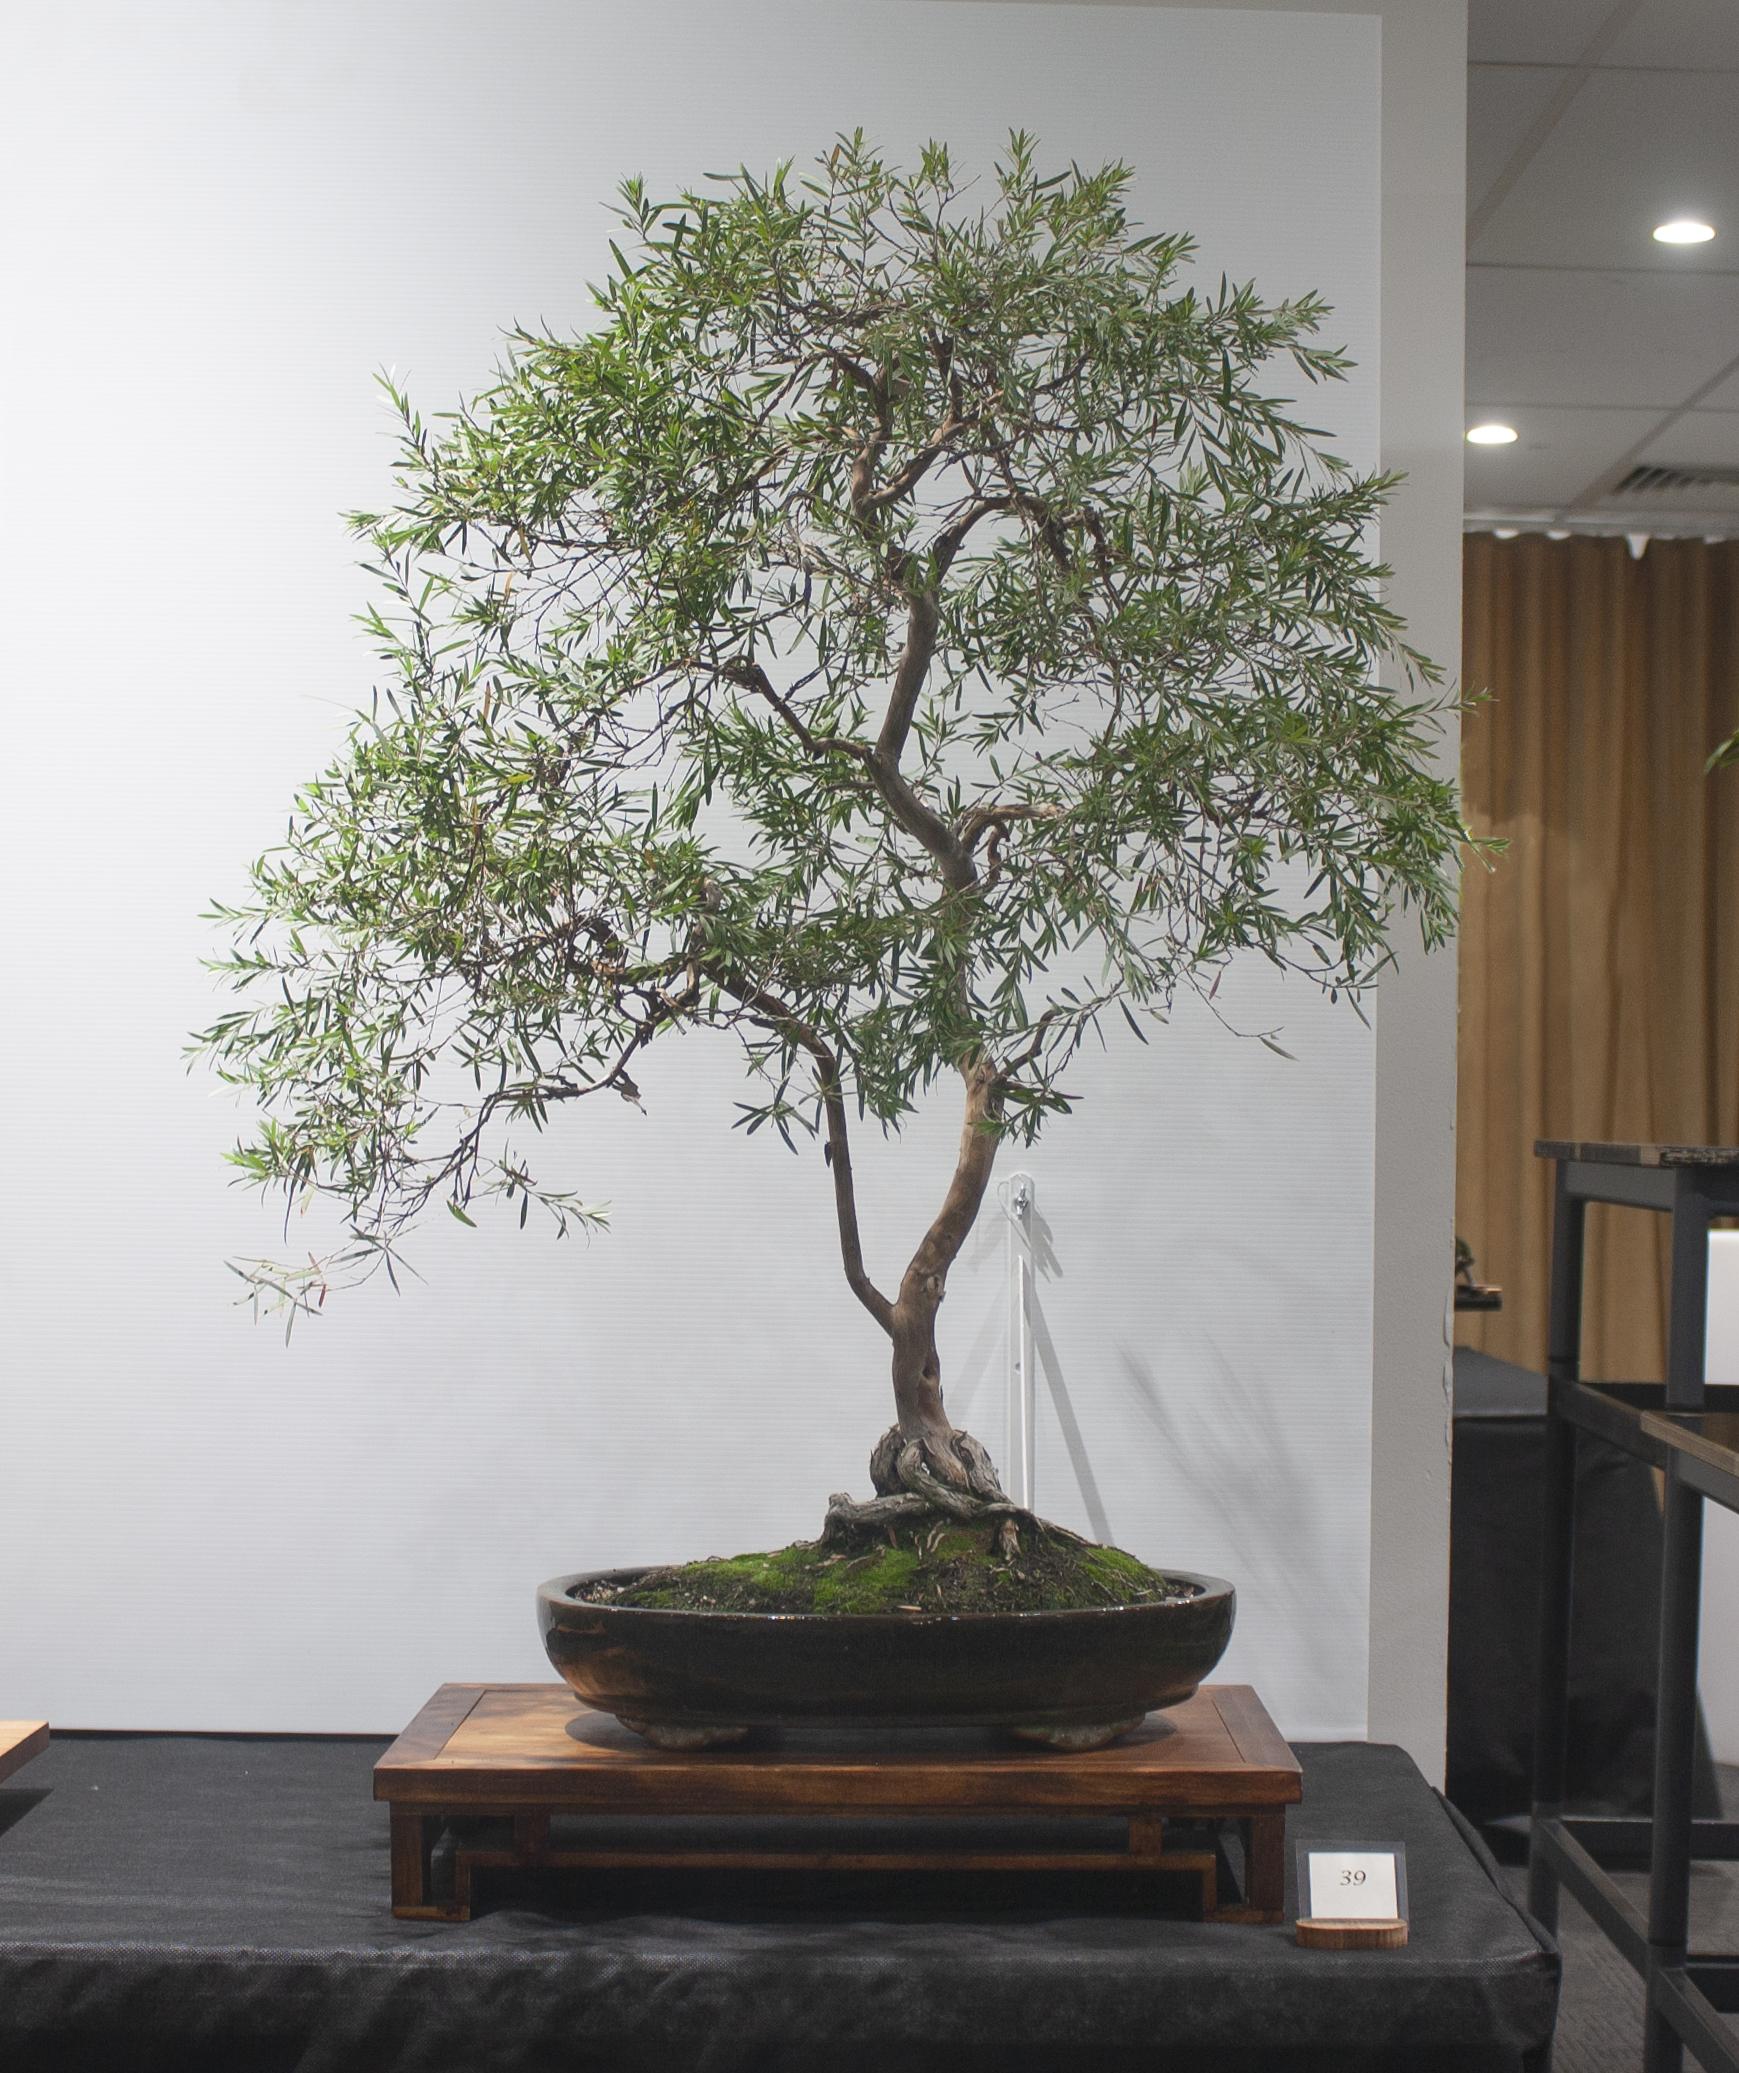 39 Leptospermum madidum ssp sativum, Silver weeping tea tree